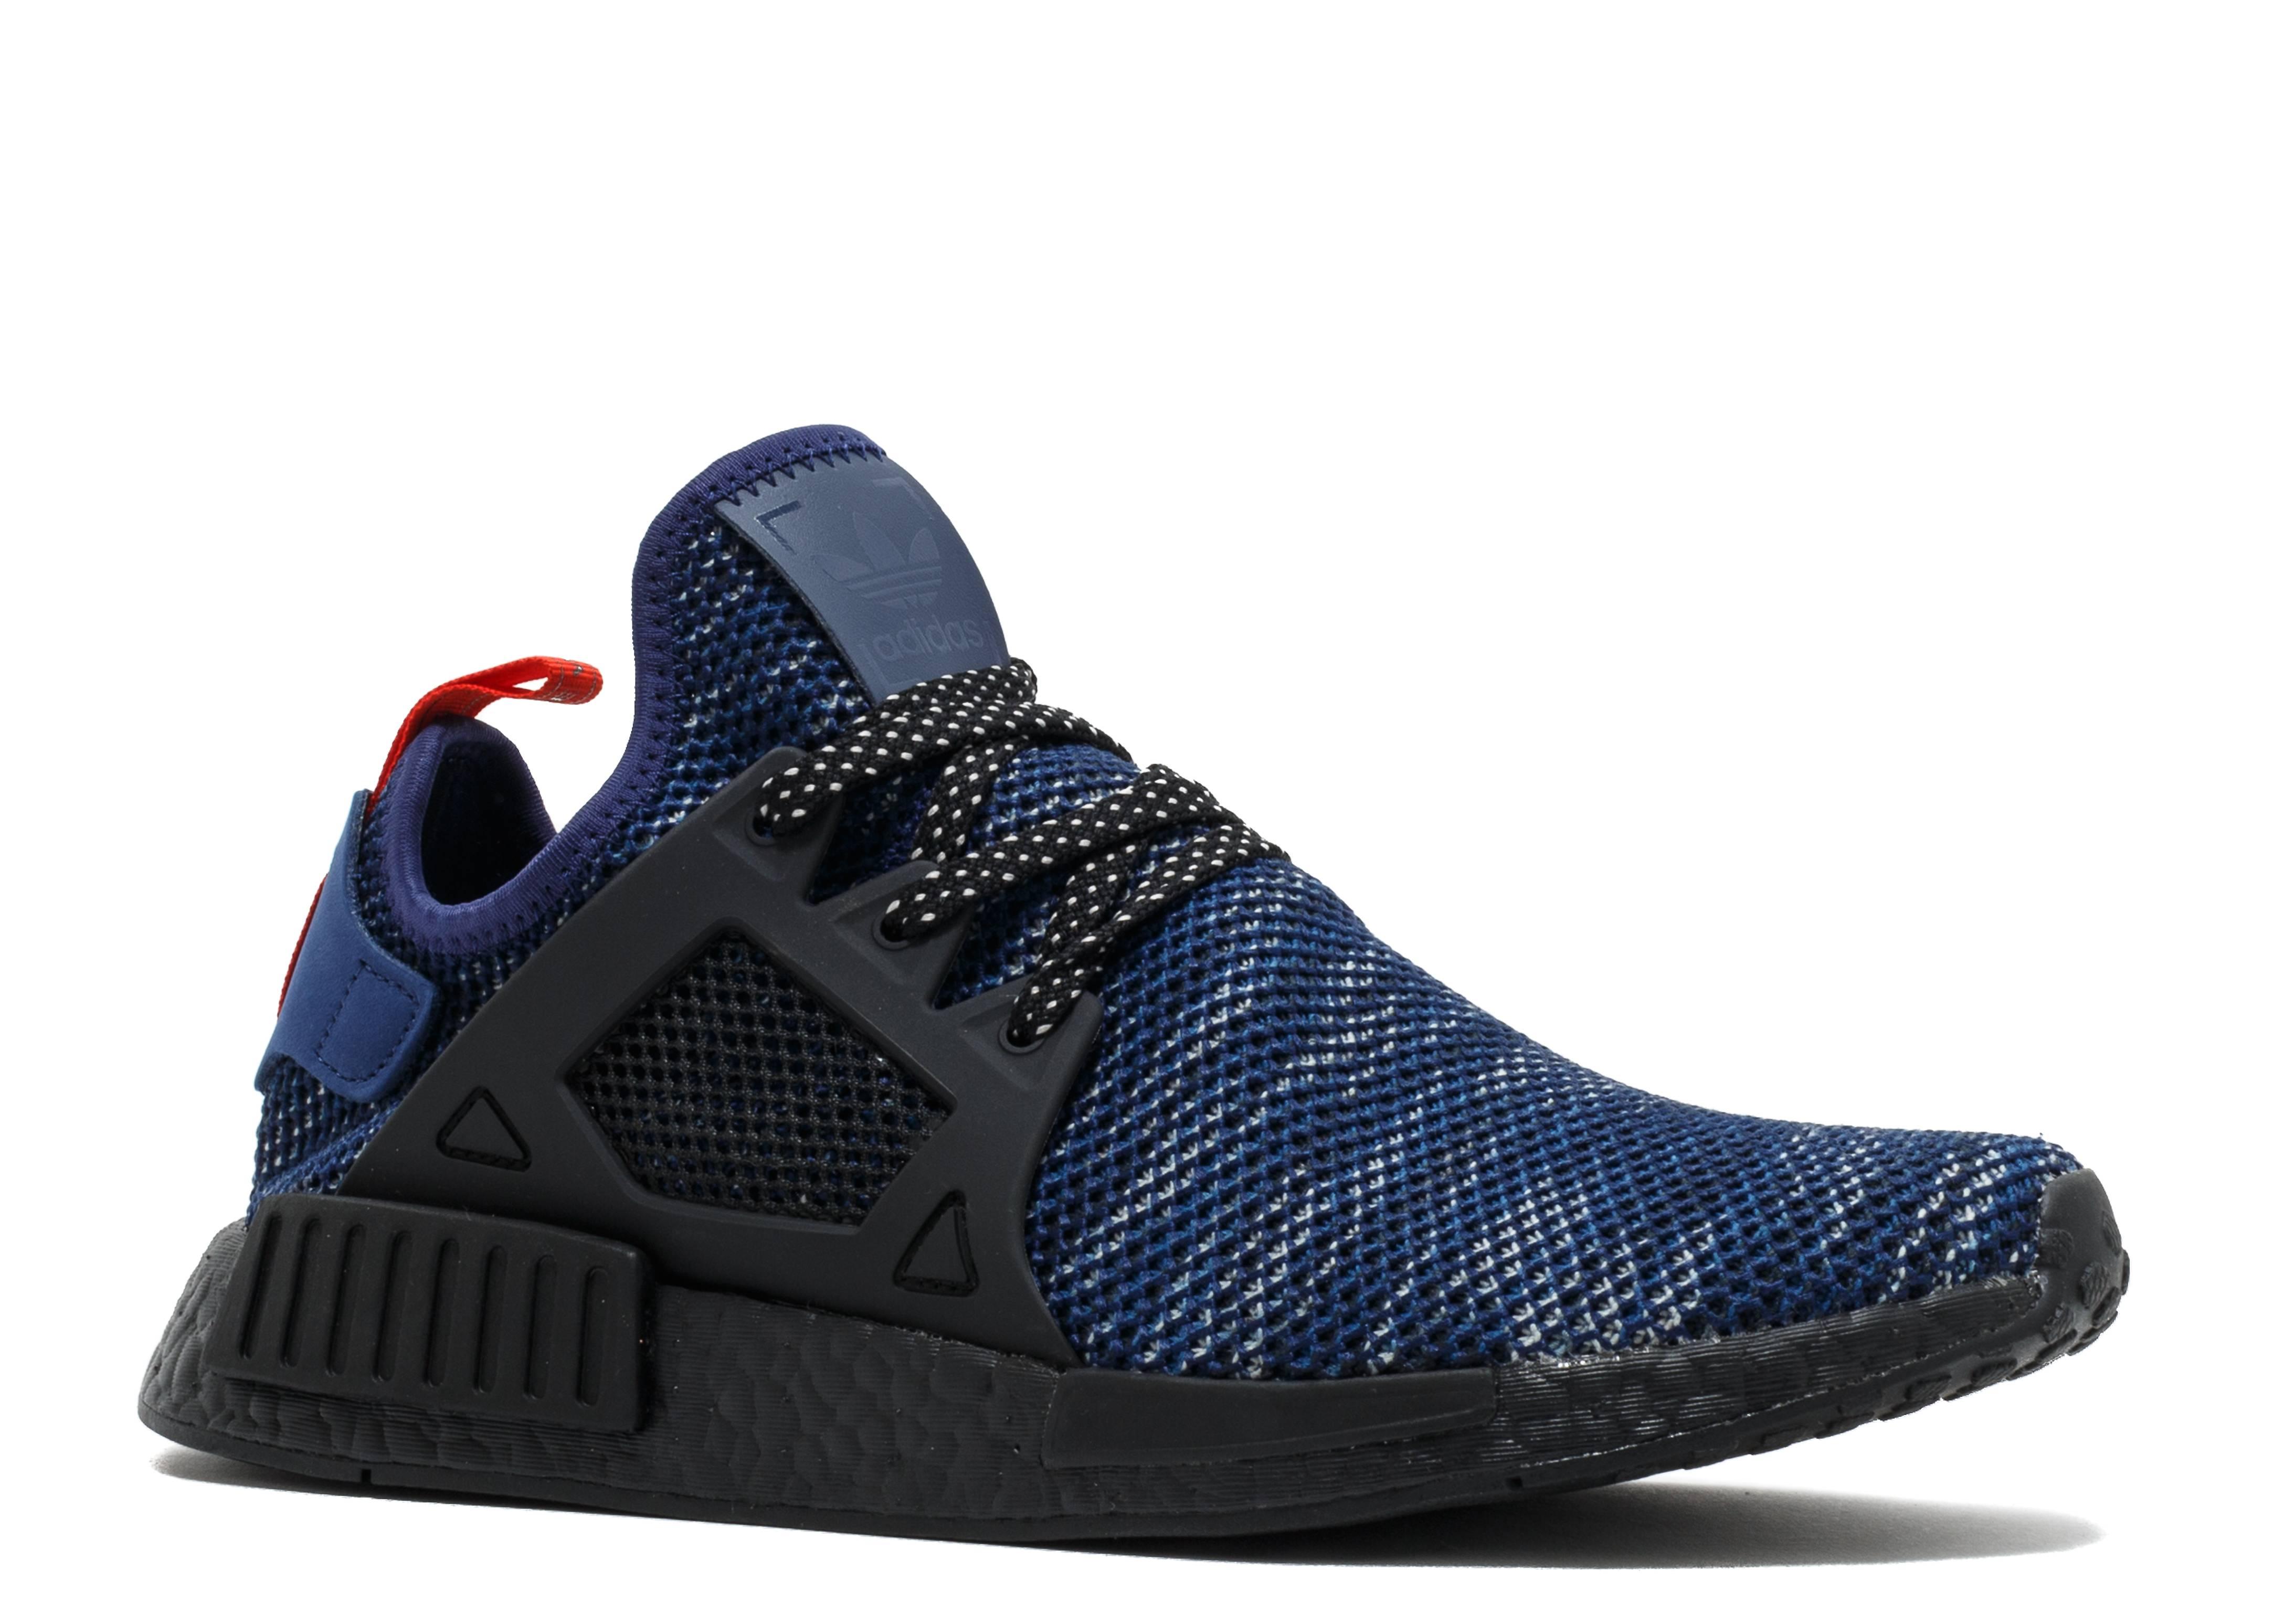 nmd xr1 jd sports adidas by9649 core blue grey core black flight club nmd xr1 jd sports